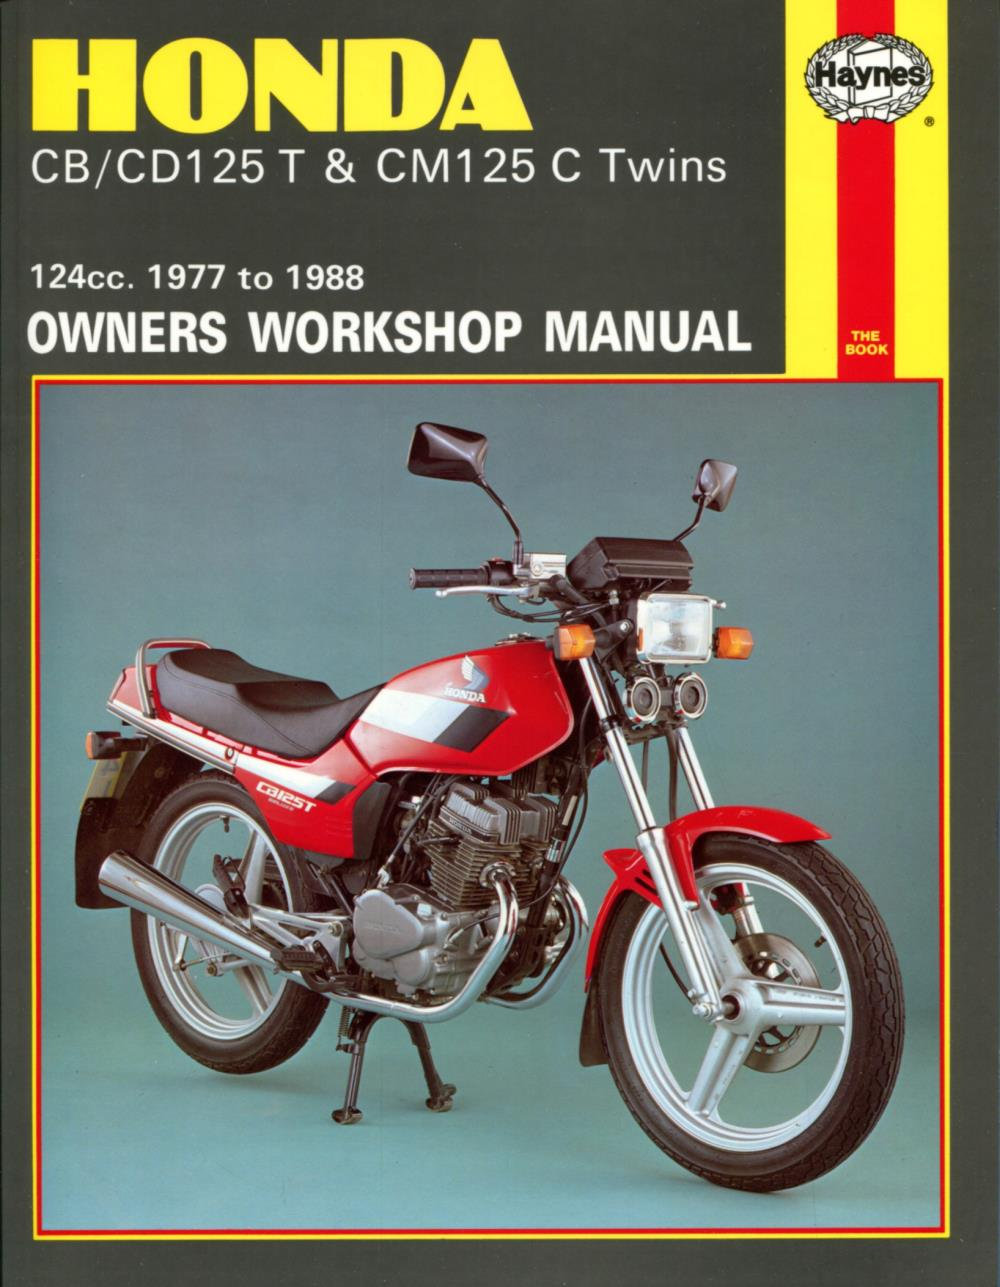 manual haynes for 1978 honda cb 125 t twin ebay rh ebay co uk 1970 Honda CB 100 1970 Honda CB 100